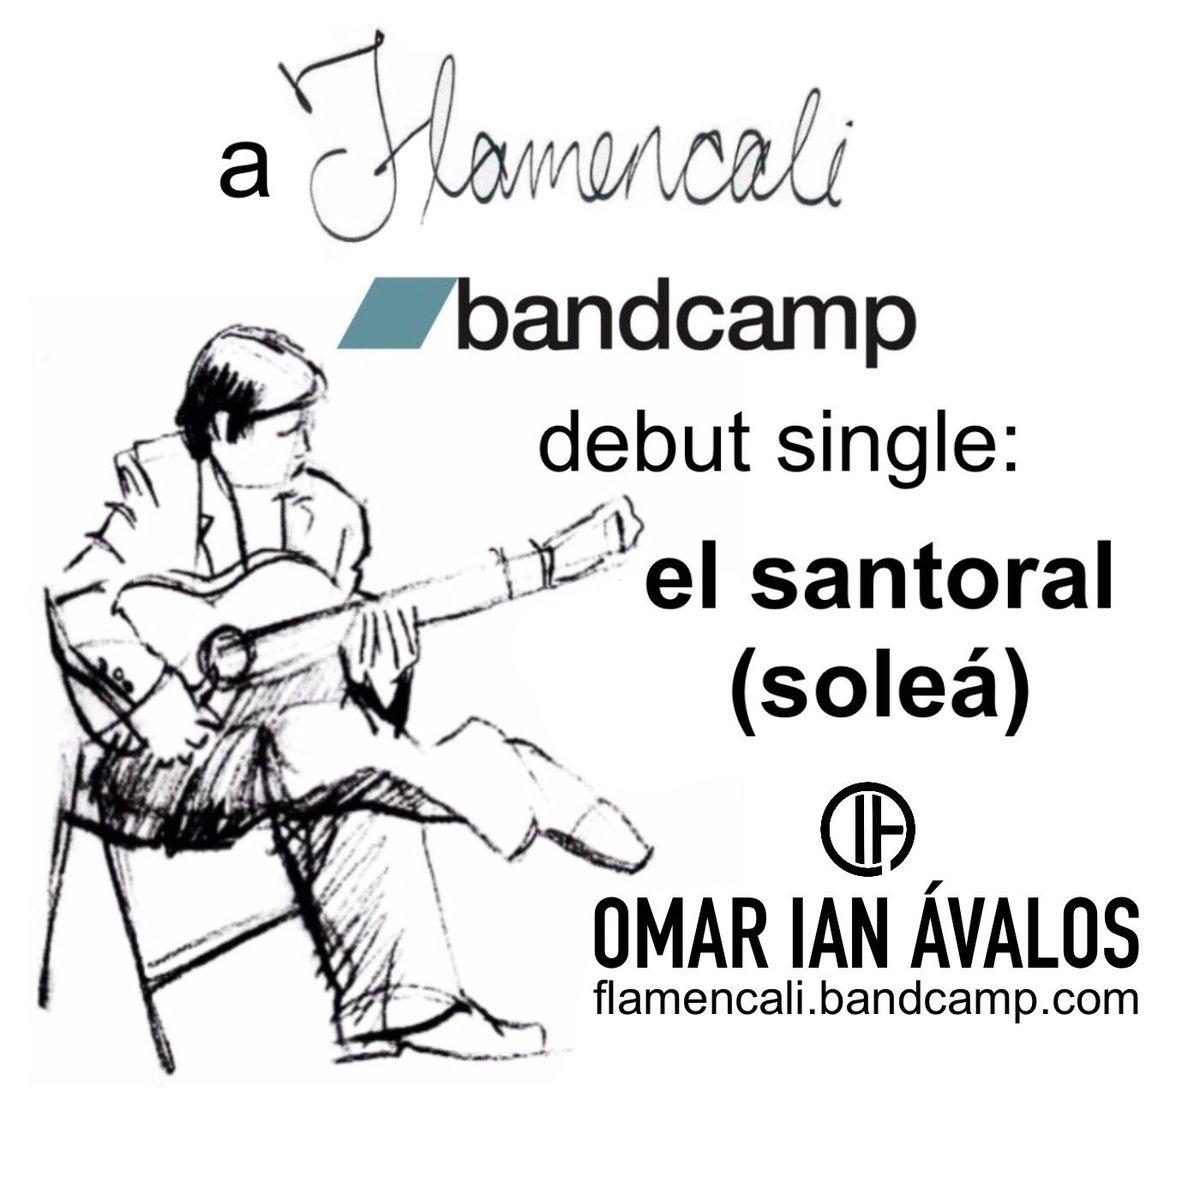 "#NowPlaying: ""El santoral,"" a soleá by flamenco guitarist Omar I. Ávalos. Own the single exclusively on #Bandcamp. https://buff.ly/36ELohl #flamencoguitar #guitarraflamenca #solea pic.twitter.com/vmKfwXJqsL"